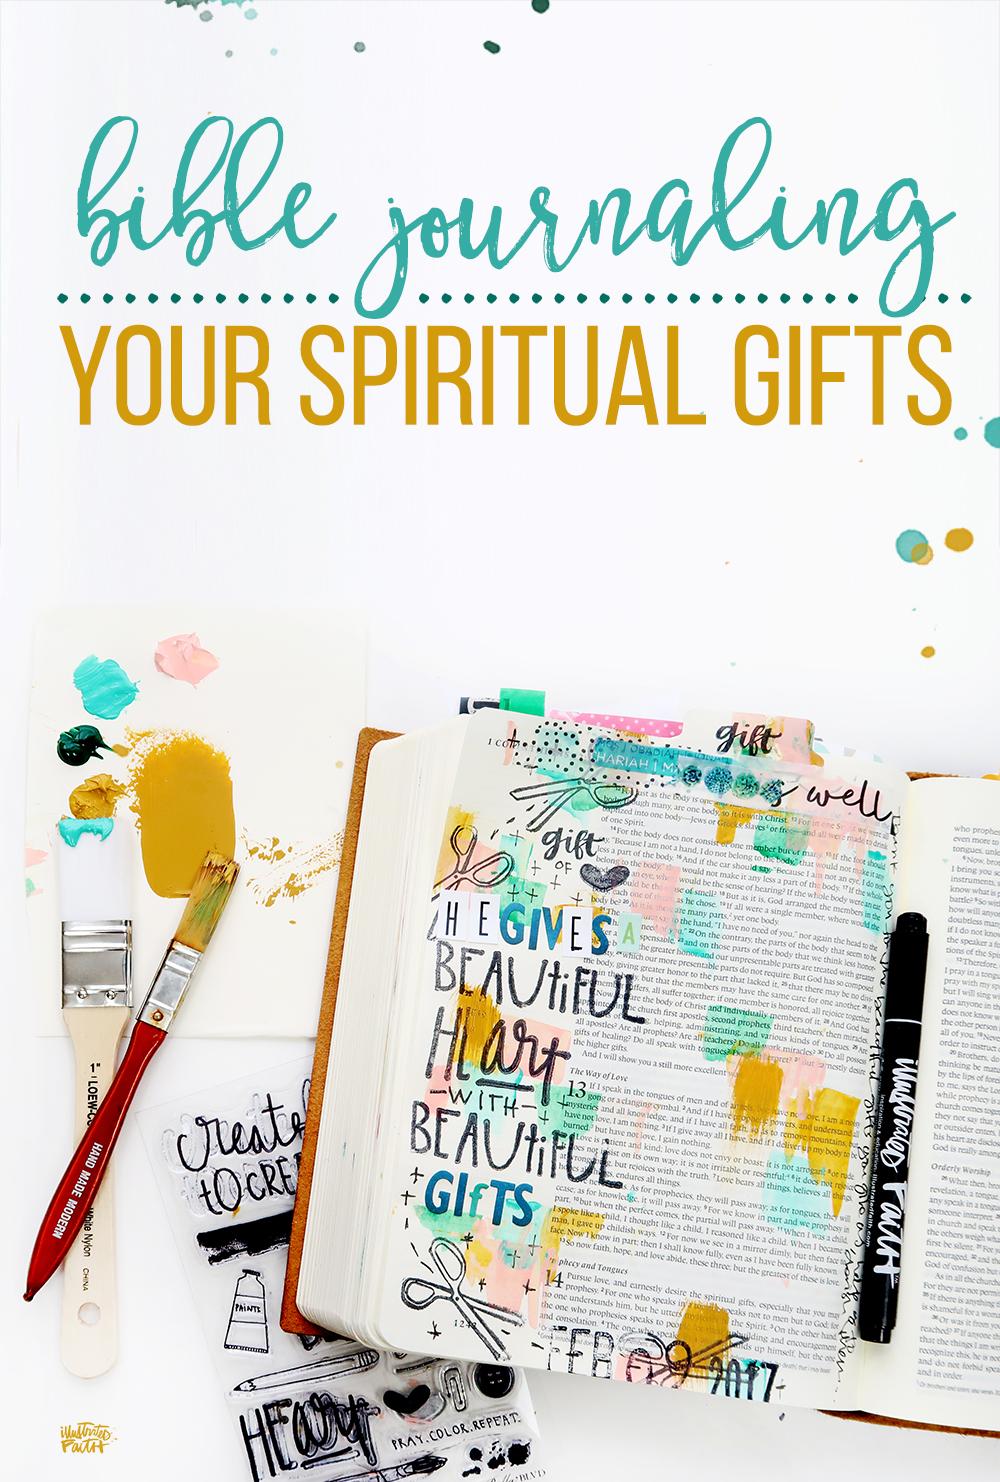 mixed media Bible journaling: Bible Journaling Your Spiritual Gifts by Shanna Noel